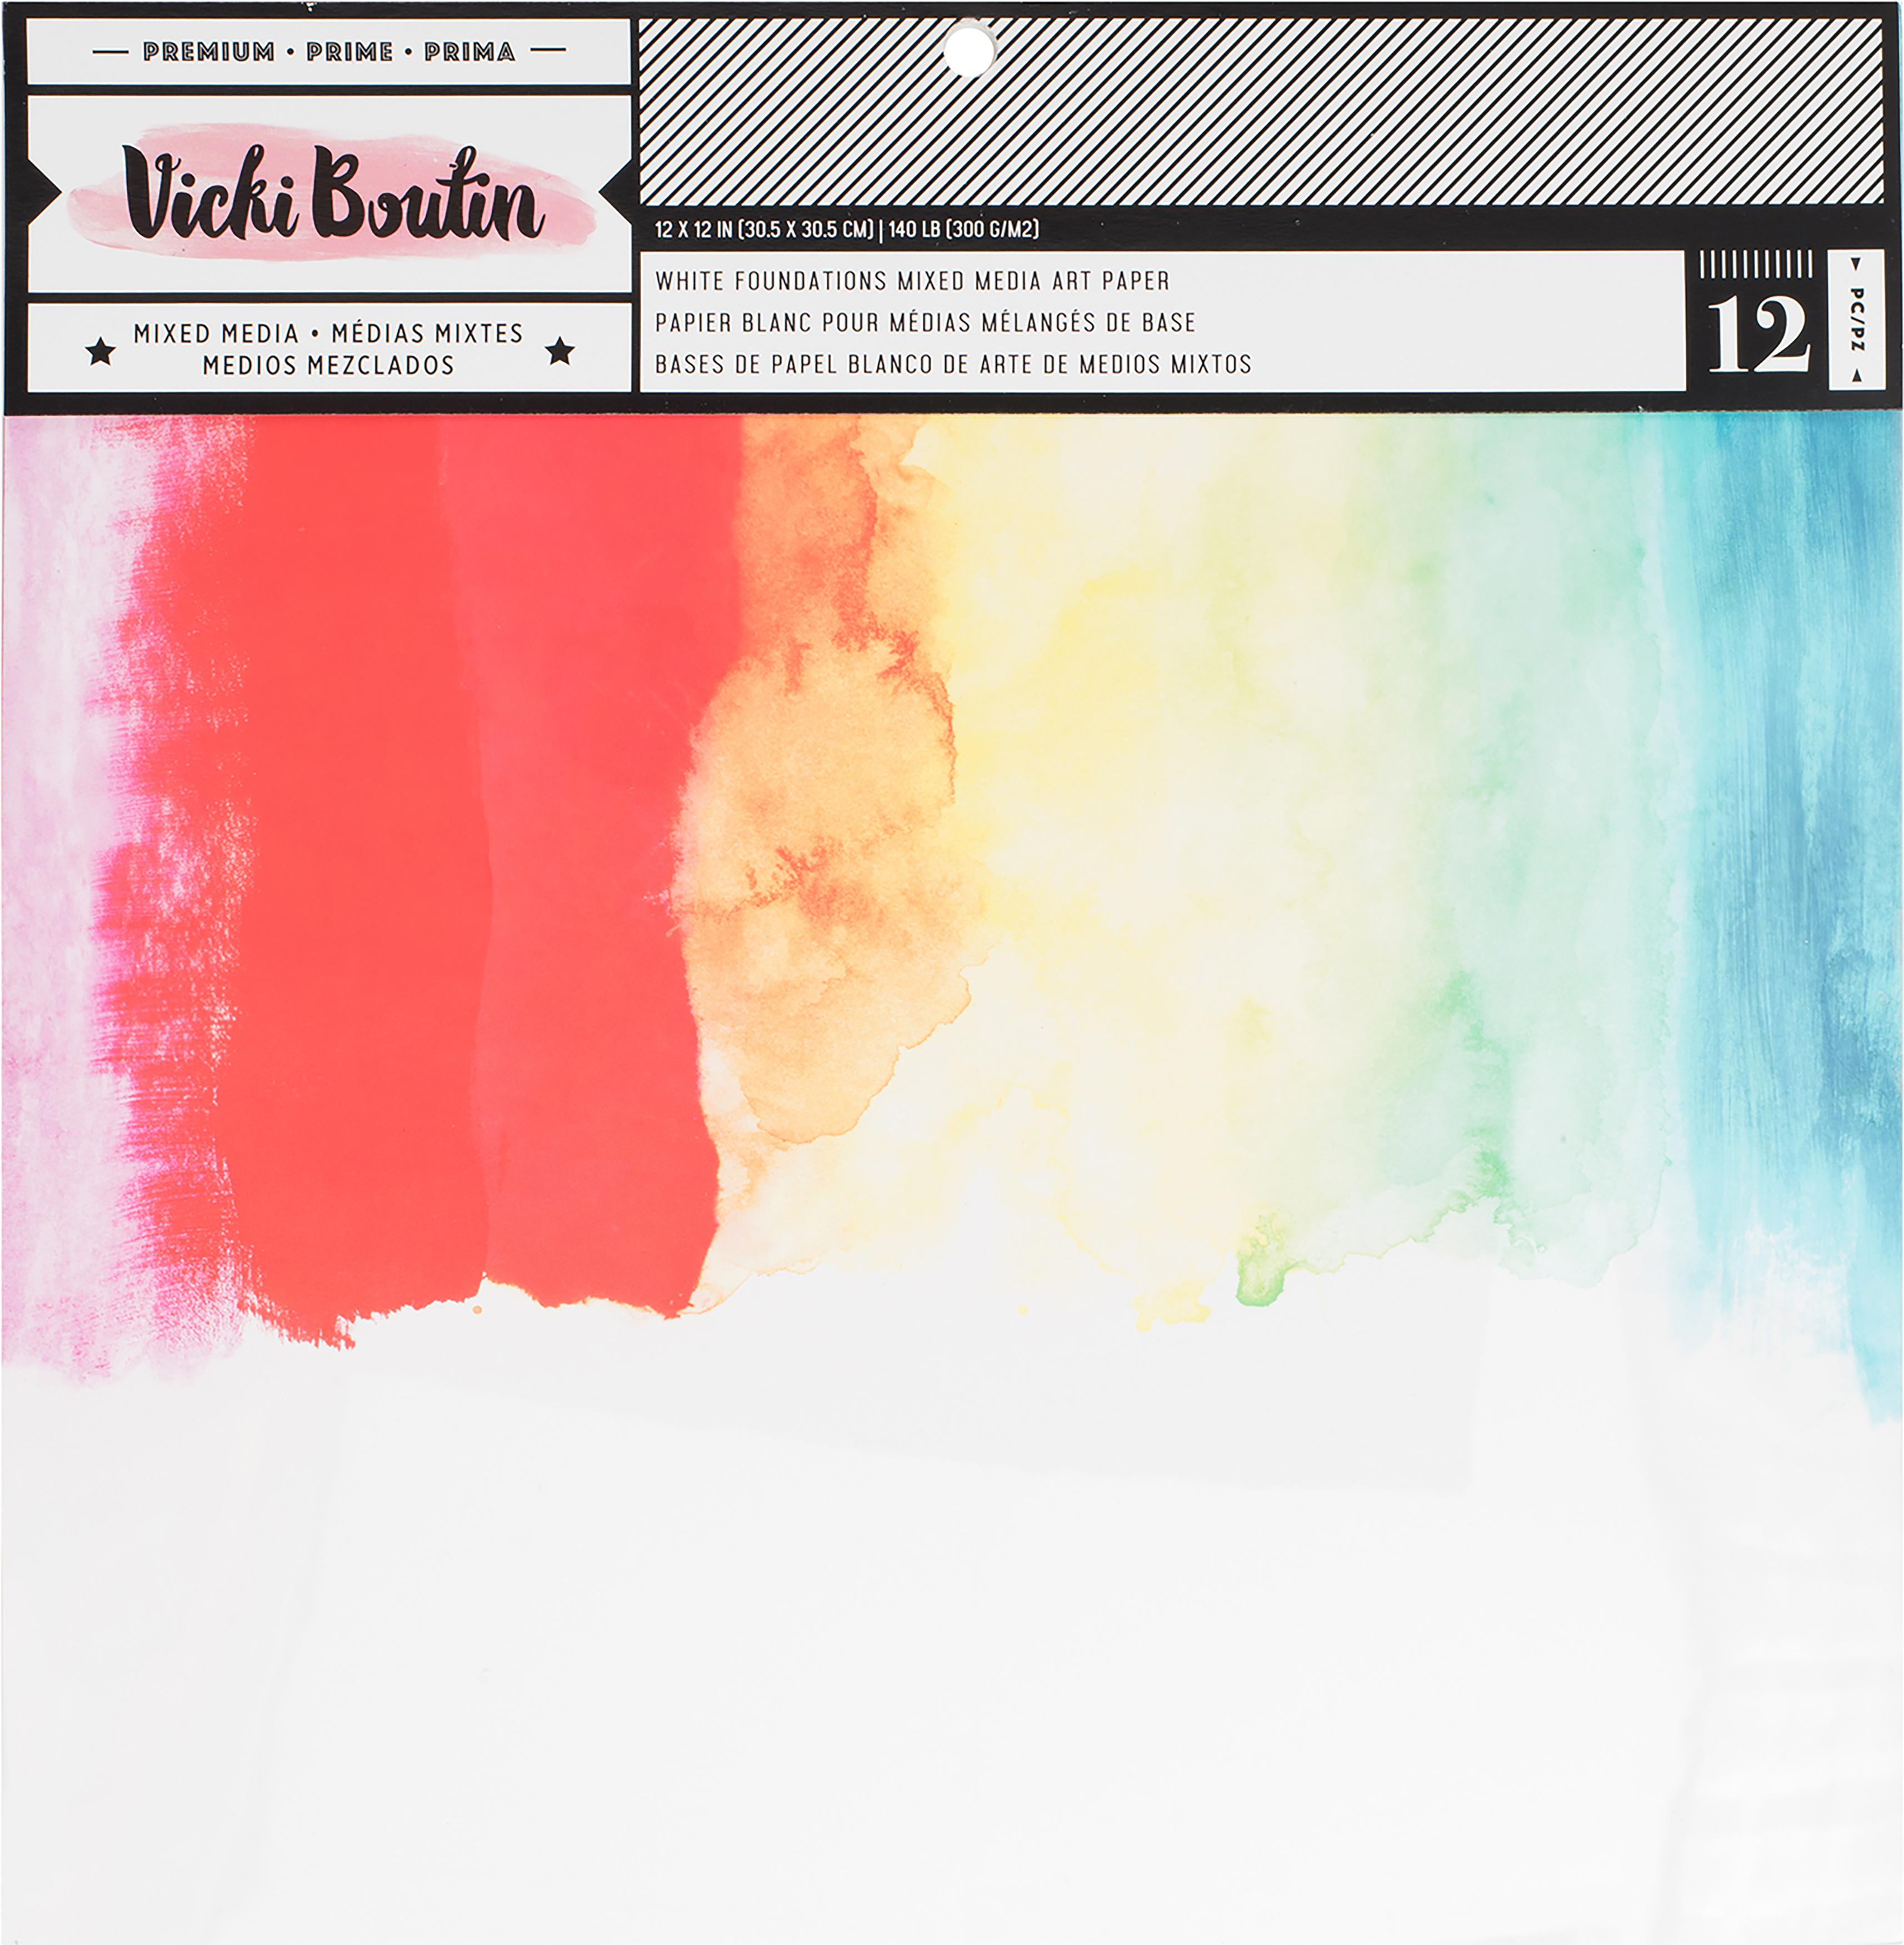 Vicki Boutin Mixed Media Foundations Paper 12X12 12/Pkg-Smooth White, 140lb